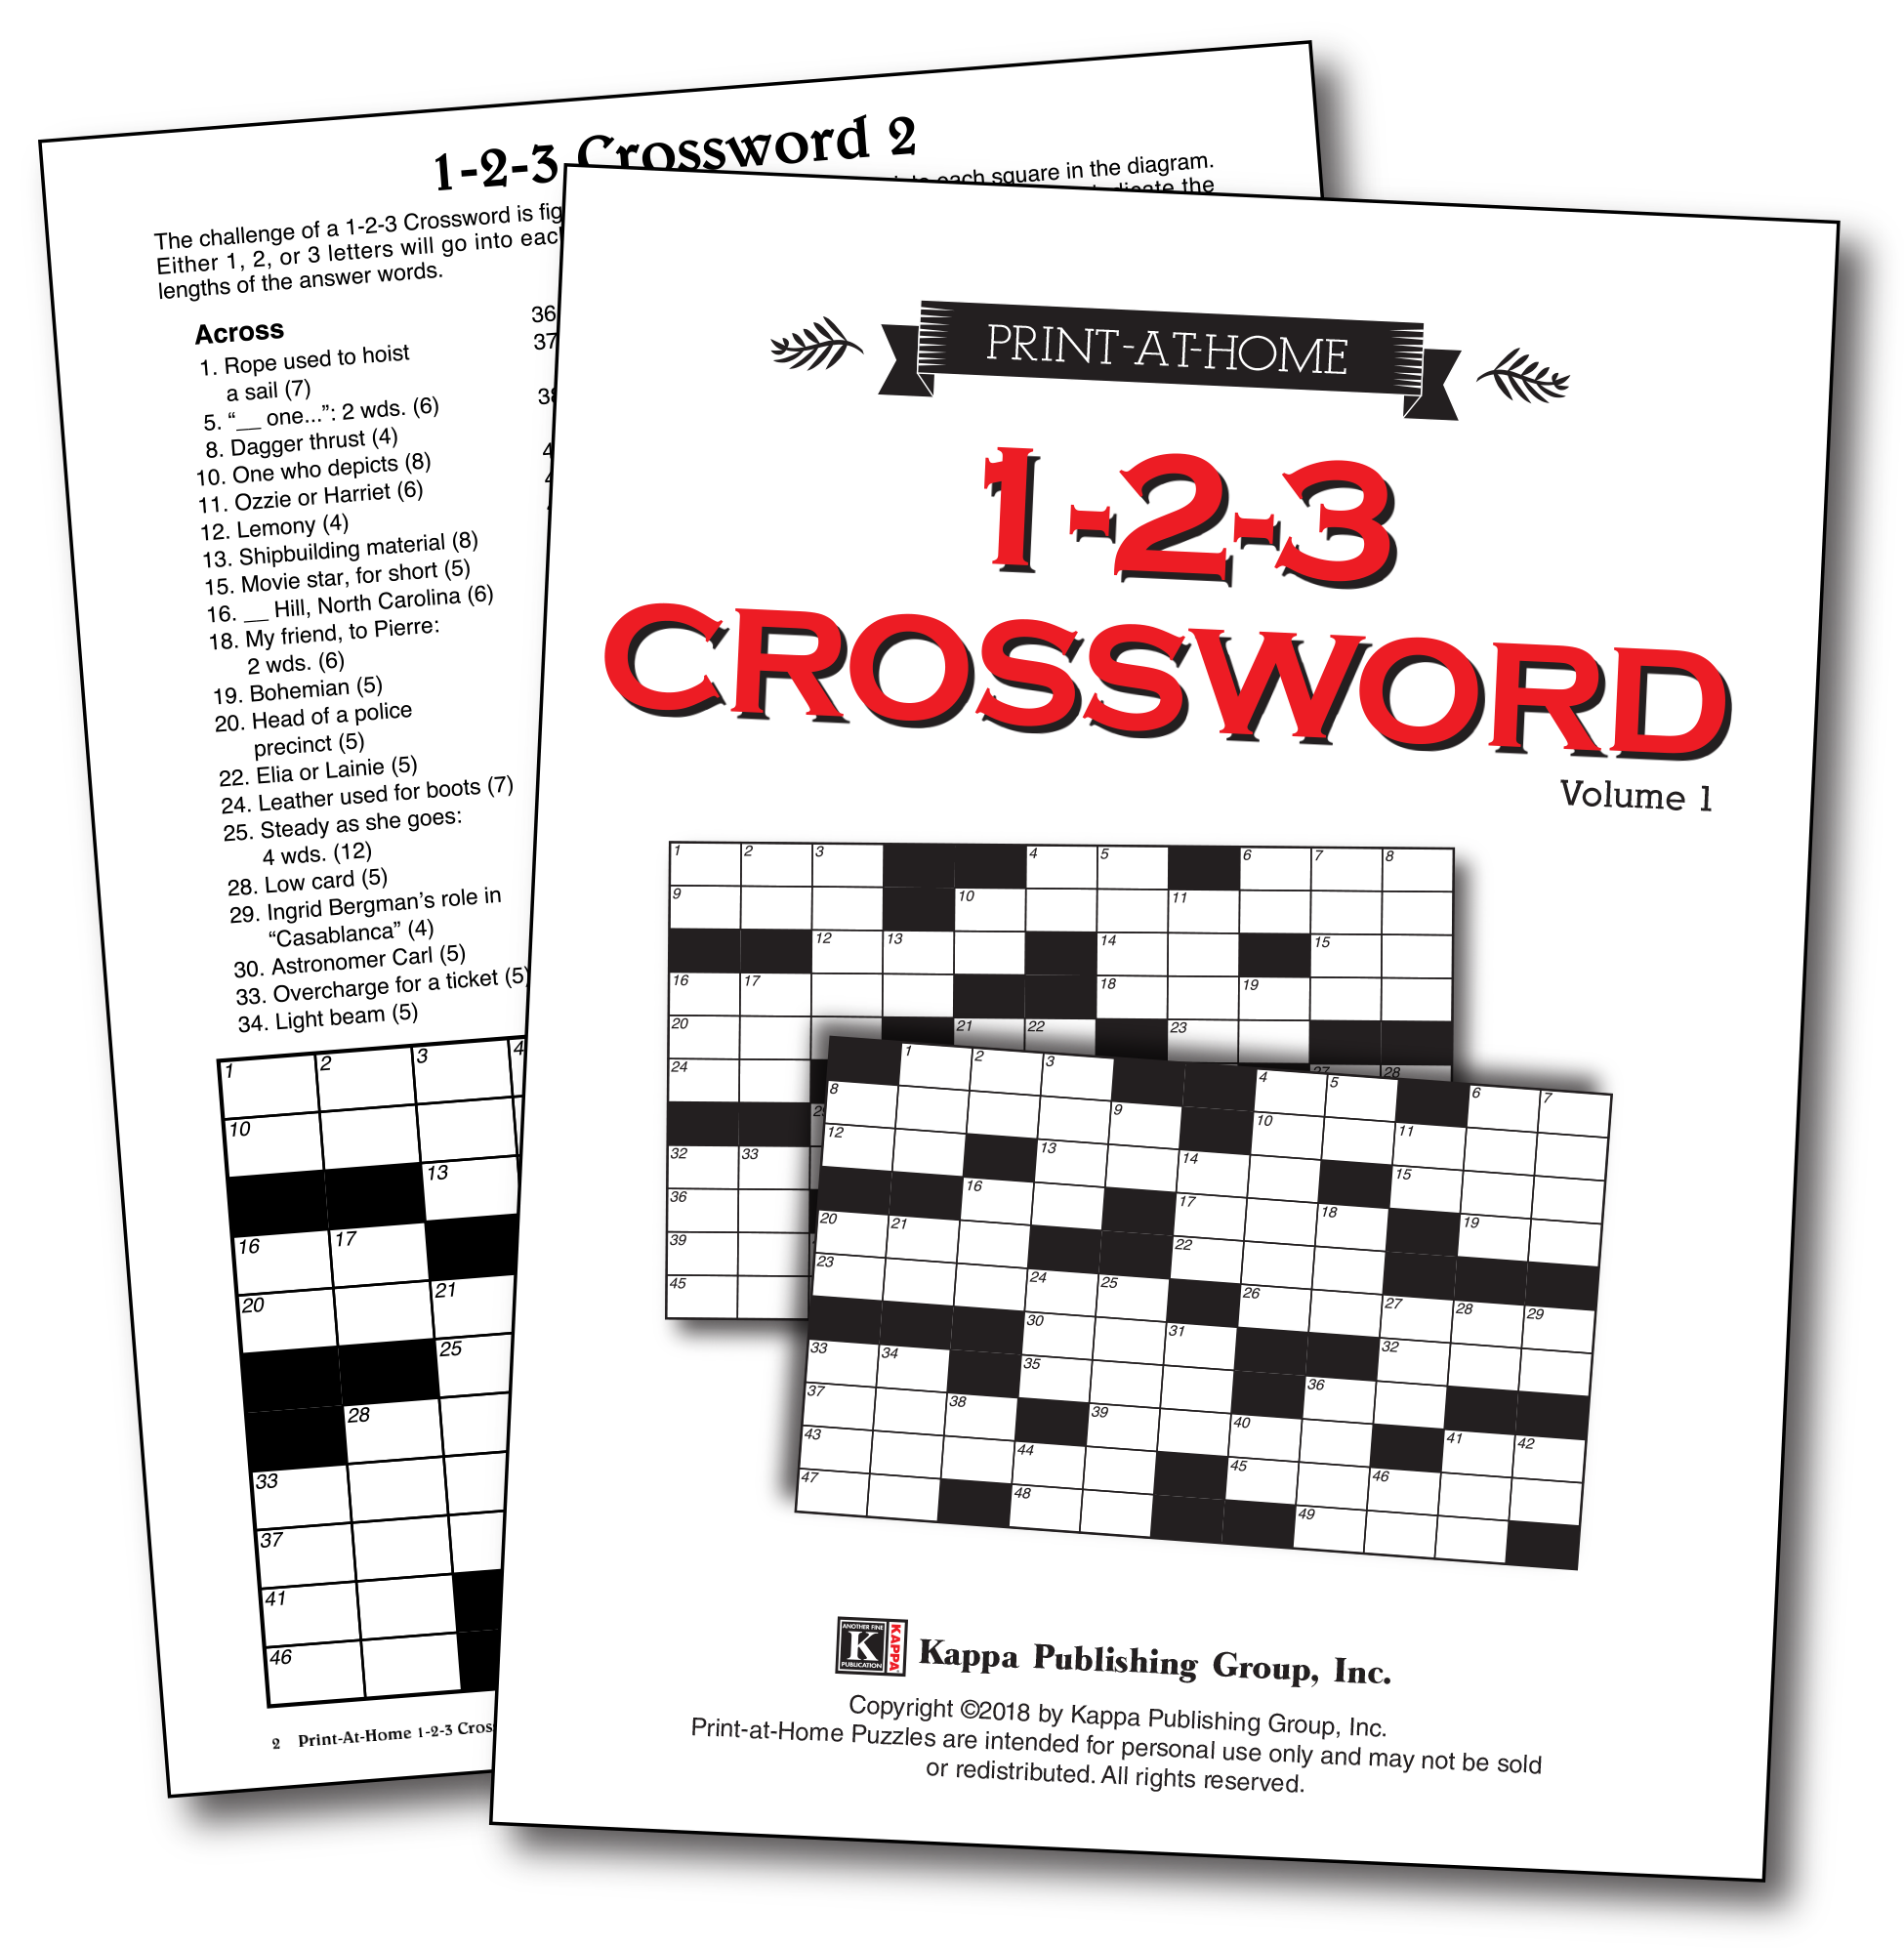 Print At Home Puzzles Kappa Logic Diagram Crossword Clue 1 2 3